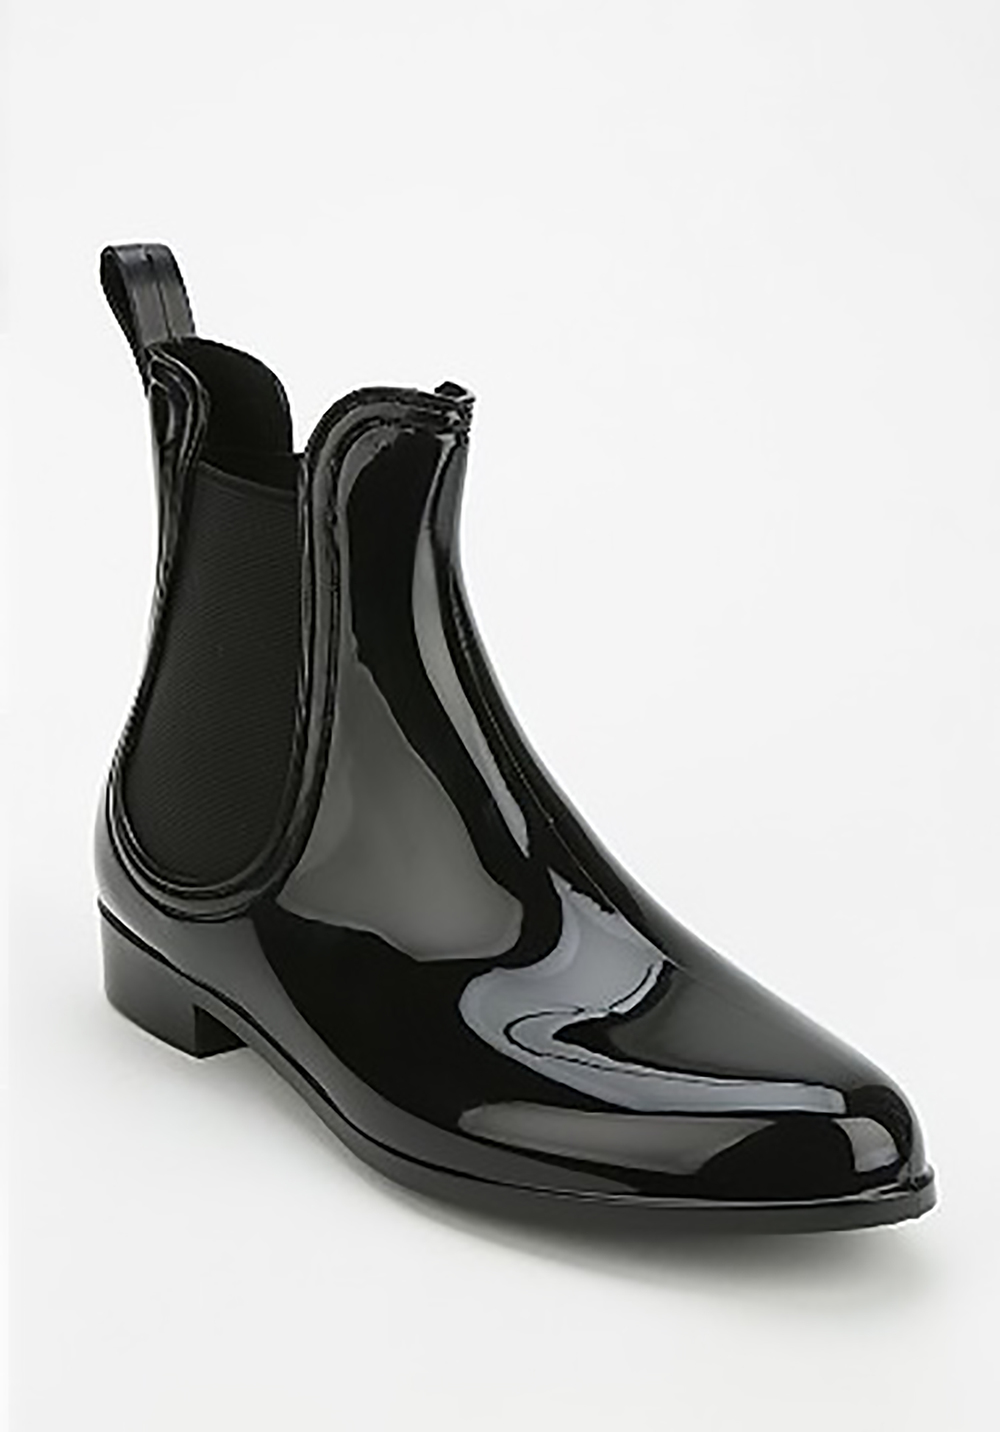 urban outfitters juju footwear chelsea rain boot rain gear 1500.jpg